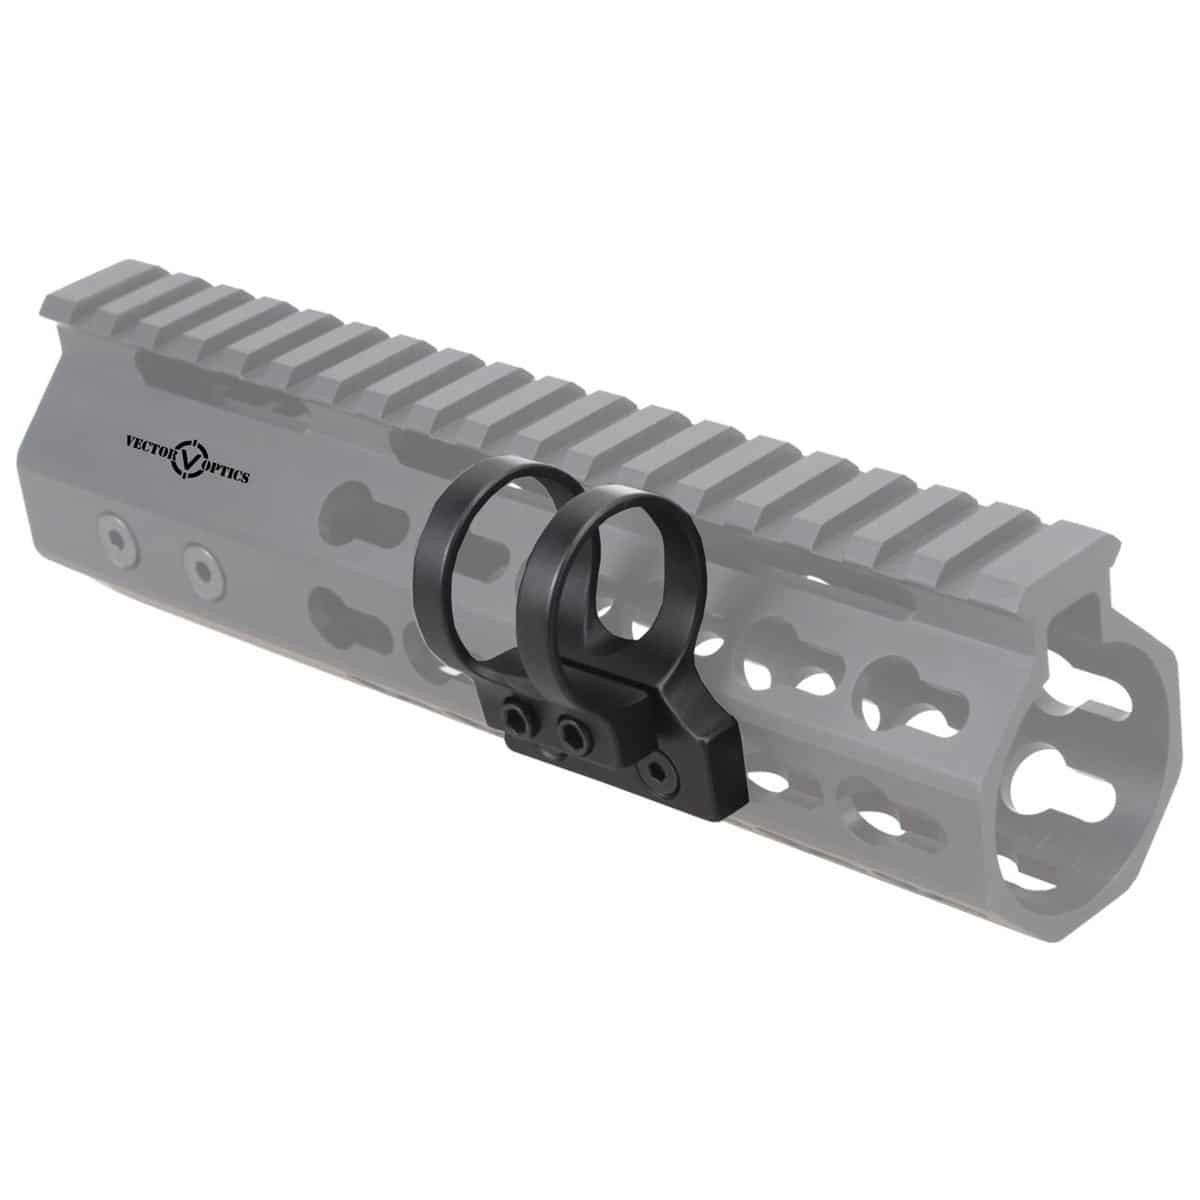 KeyMod 1 Inch Laser / Flashlight Mount